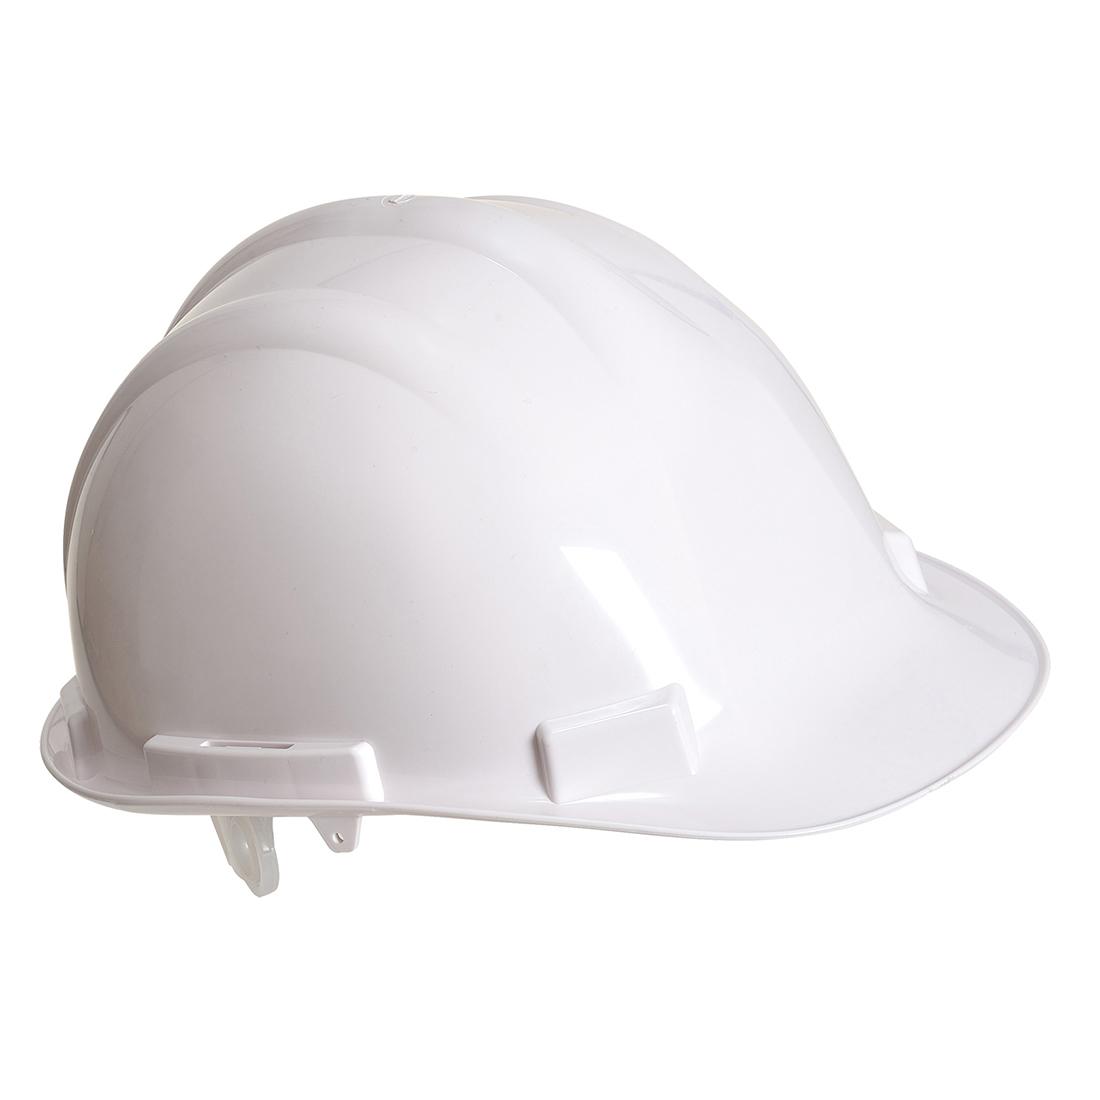 Expertbase PRO Safety Helmet